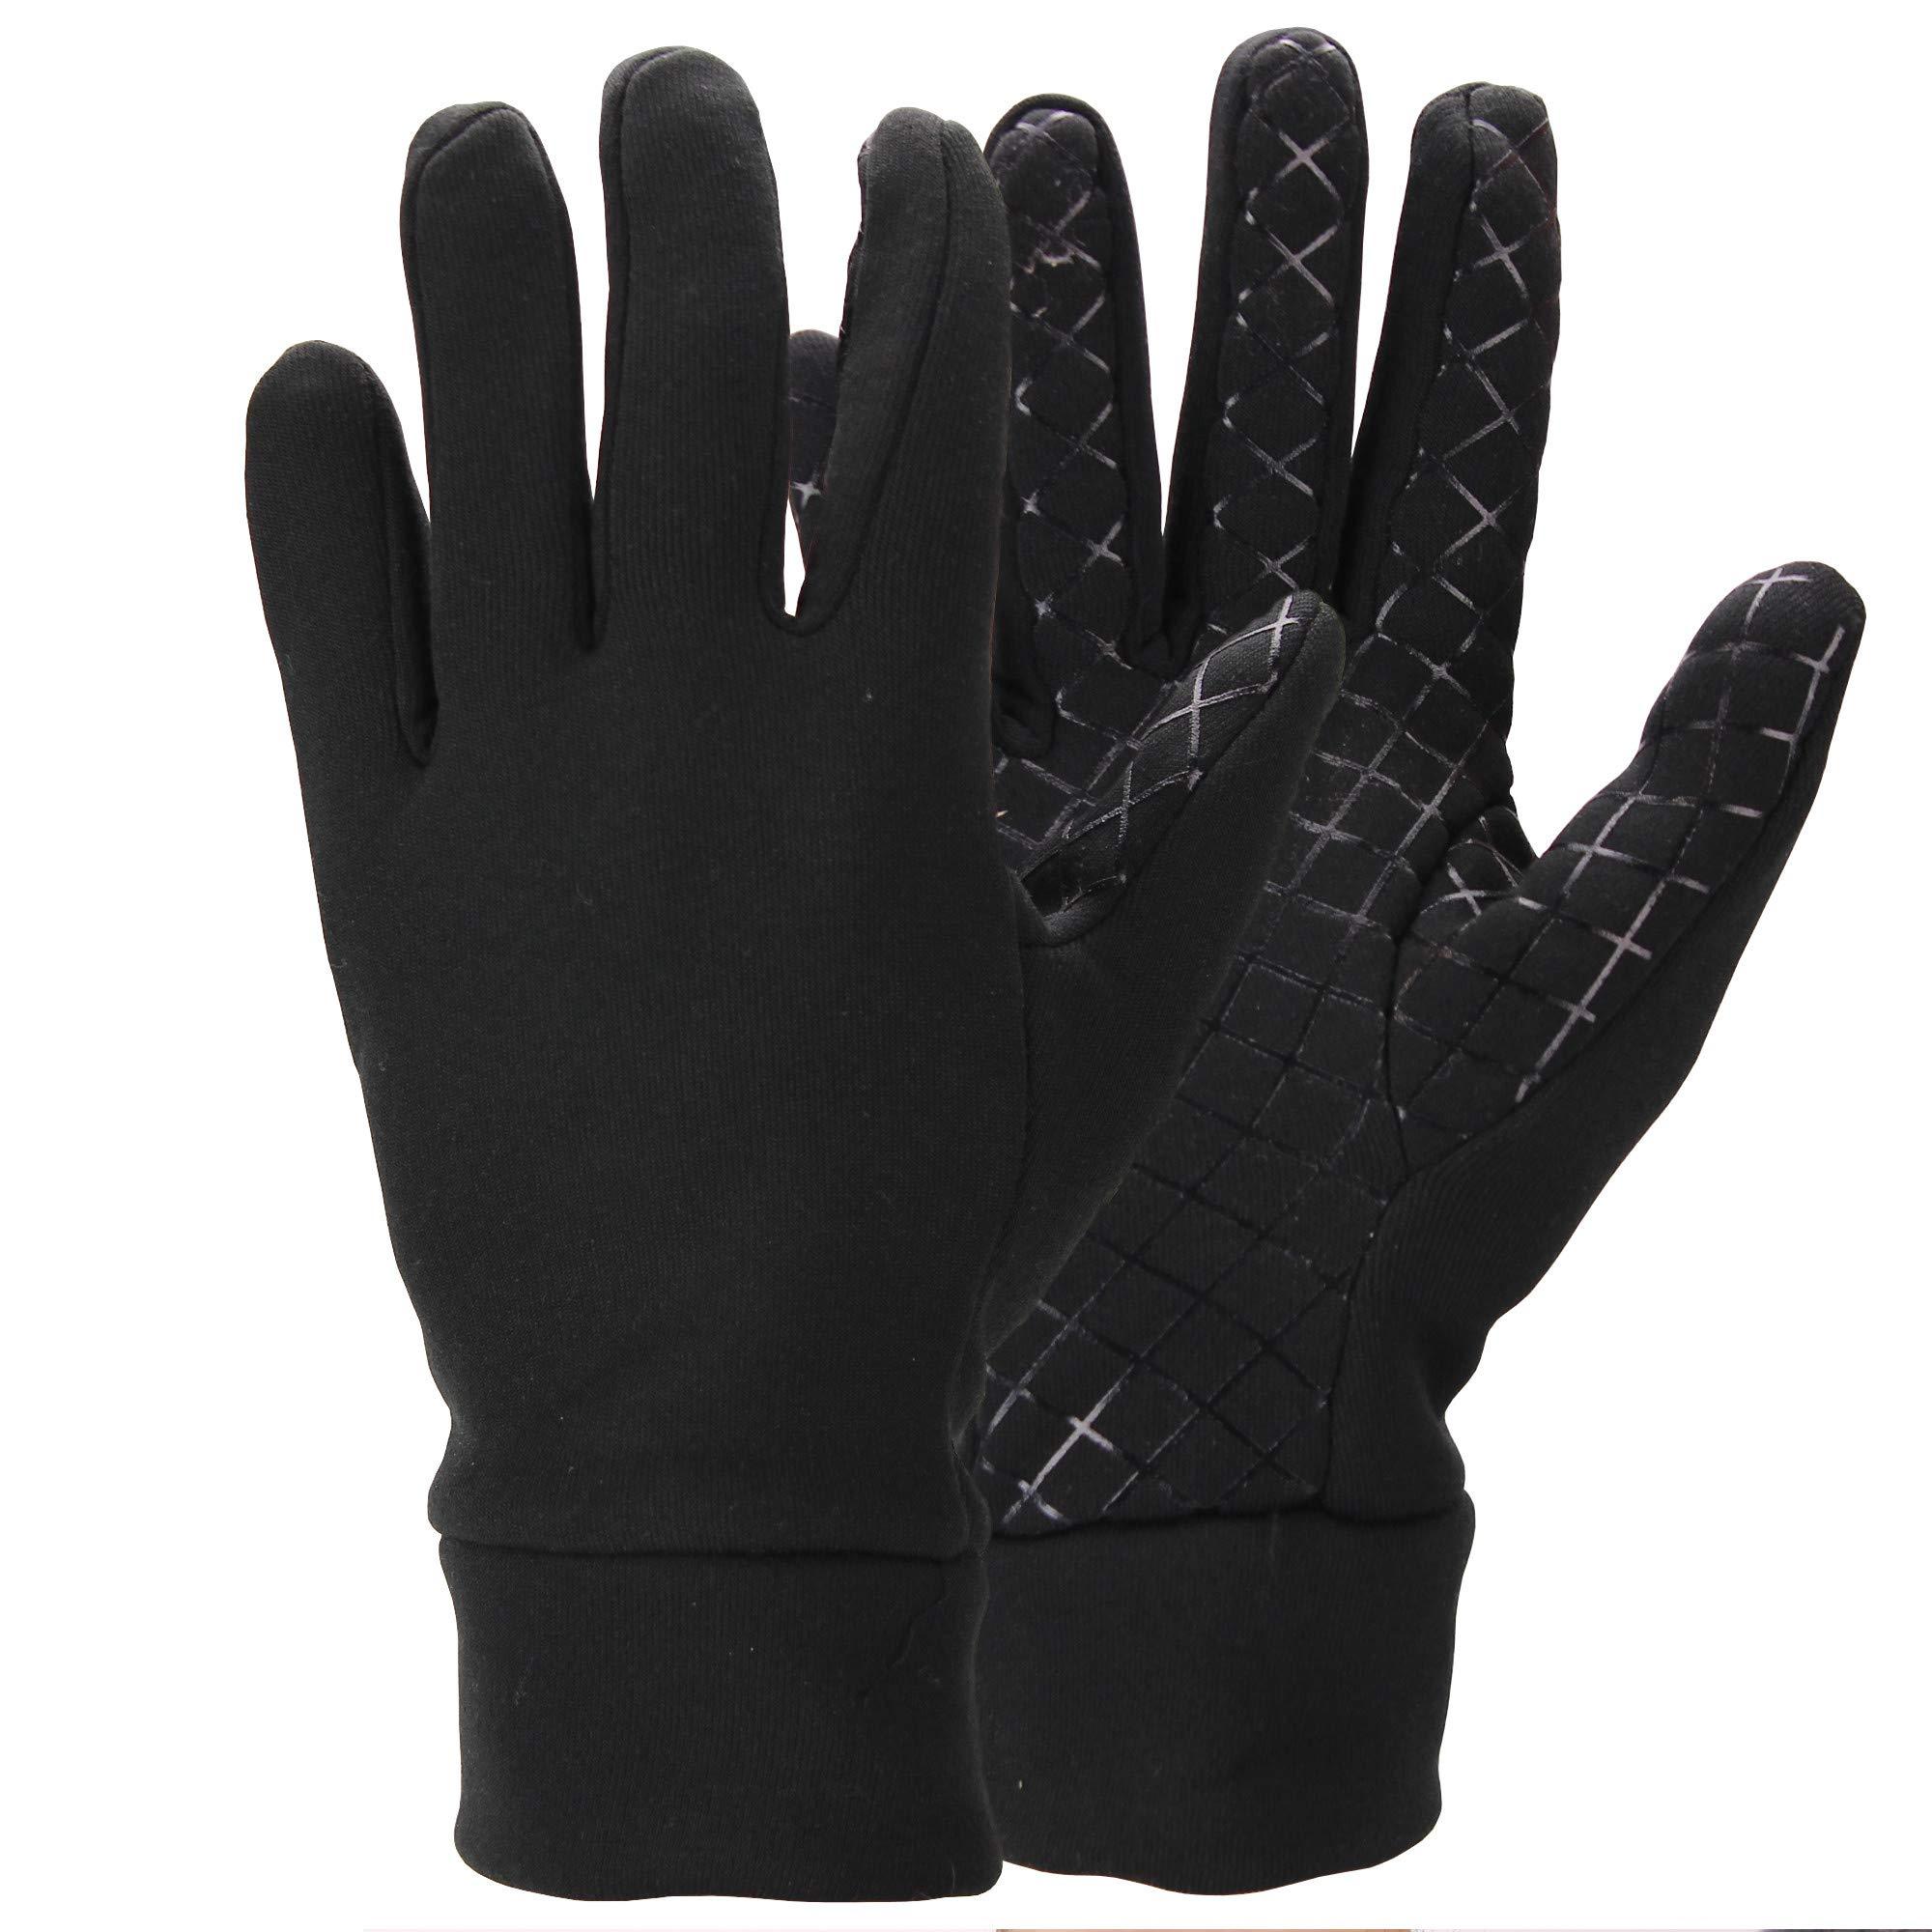 Best Rated in Men's Running Gloves & Helpful Customer